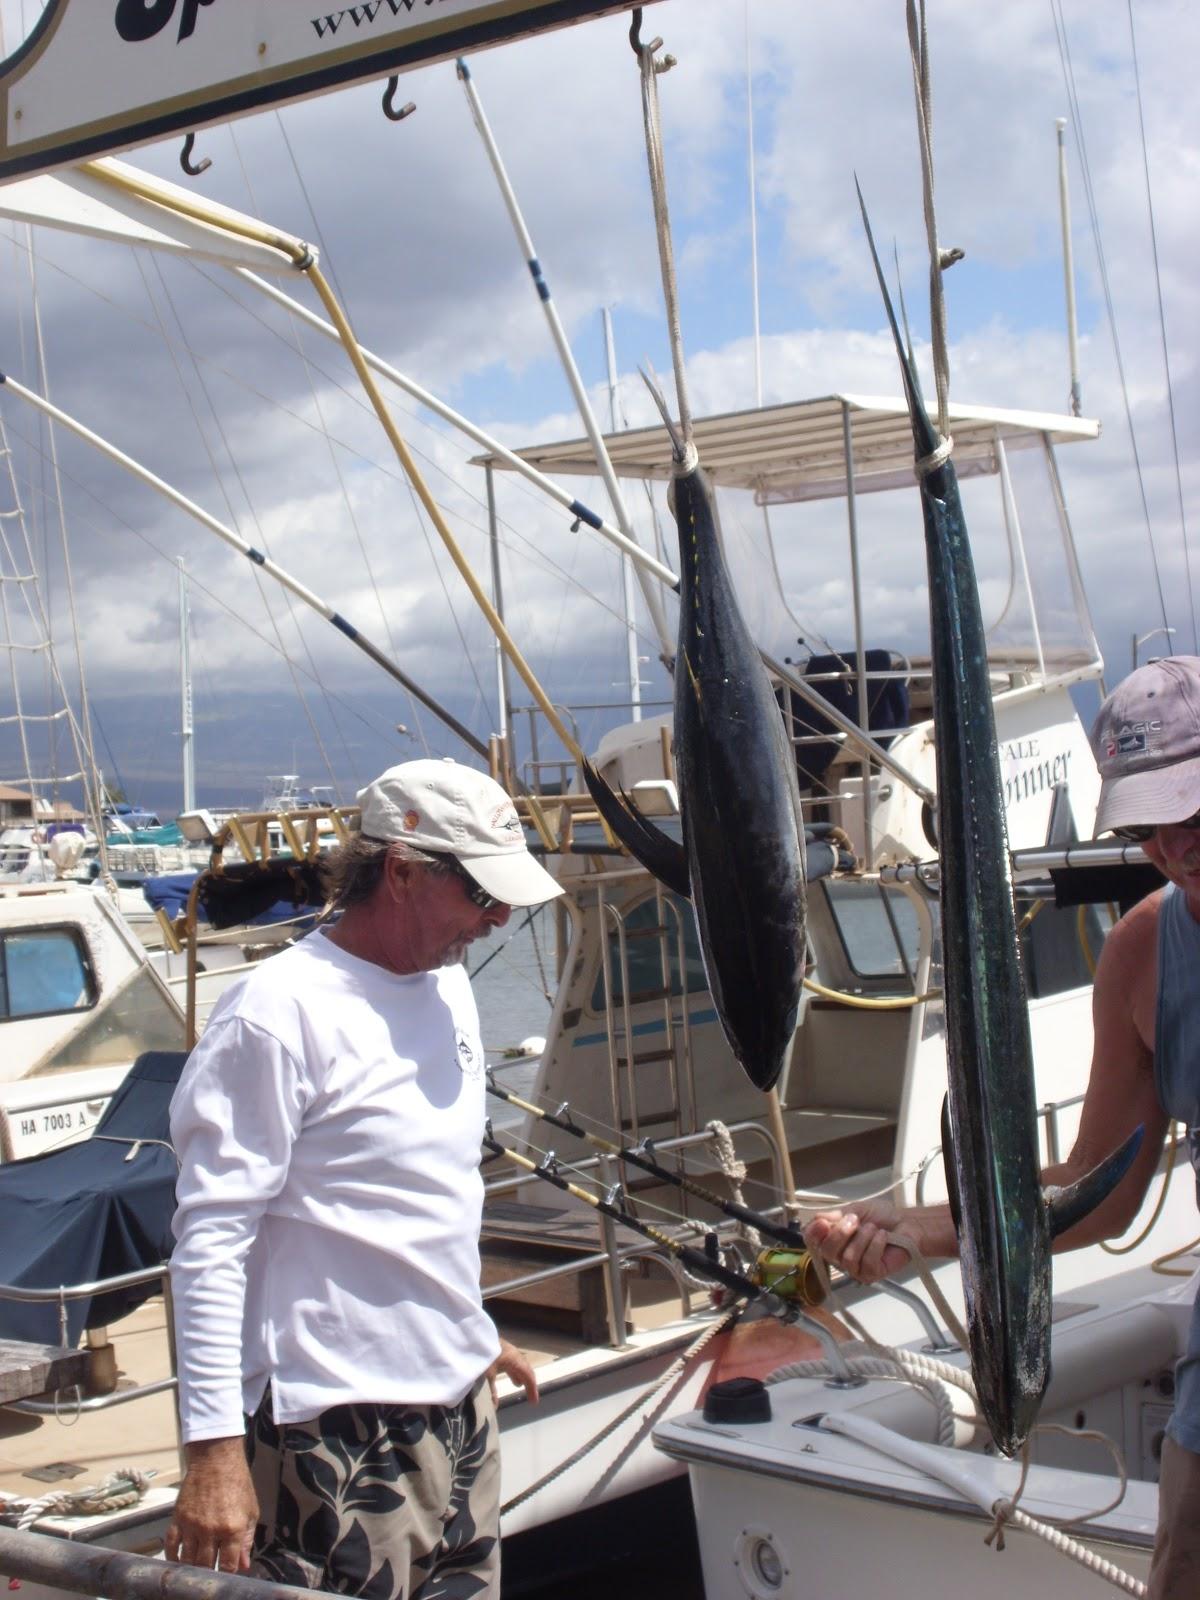 Maui sport fishing rascal fishing charters for Maui sport fishing